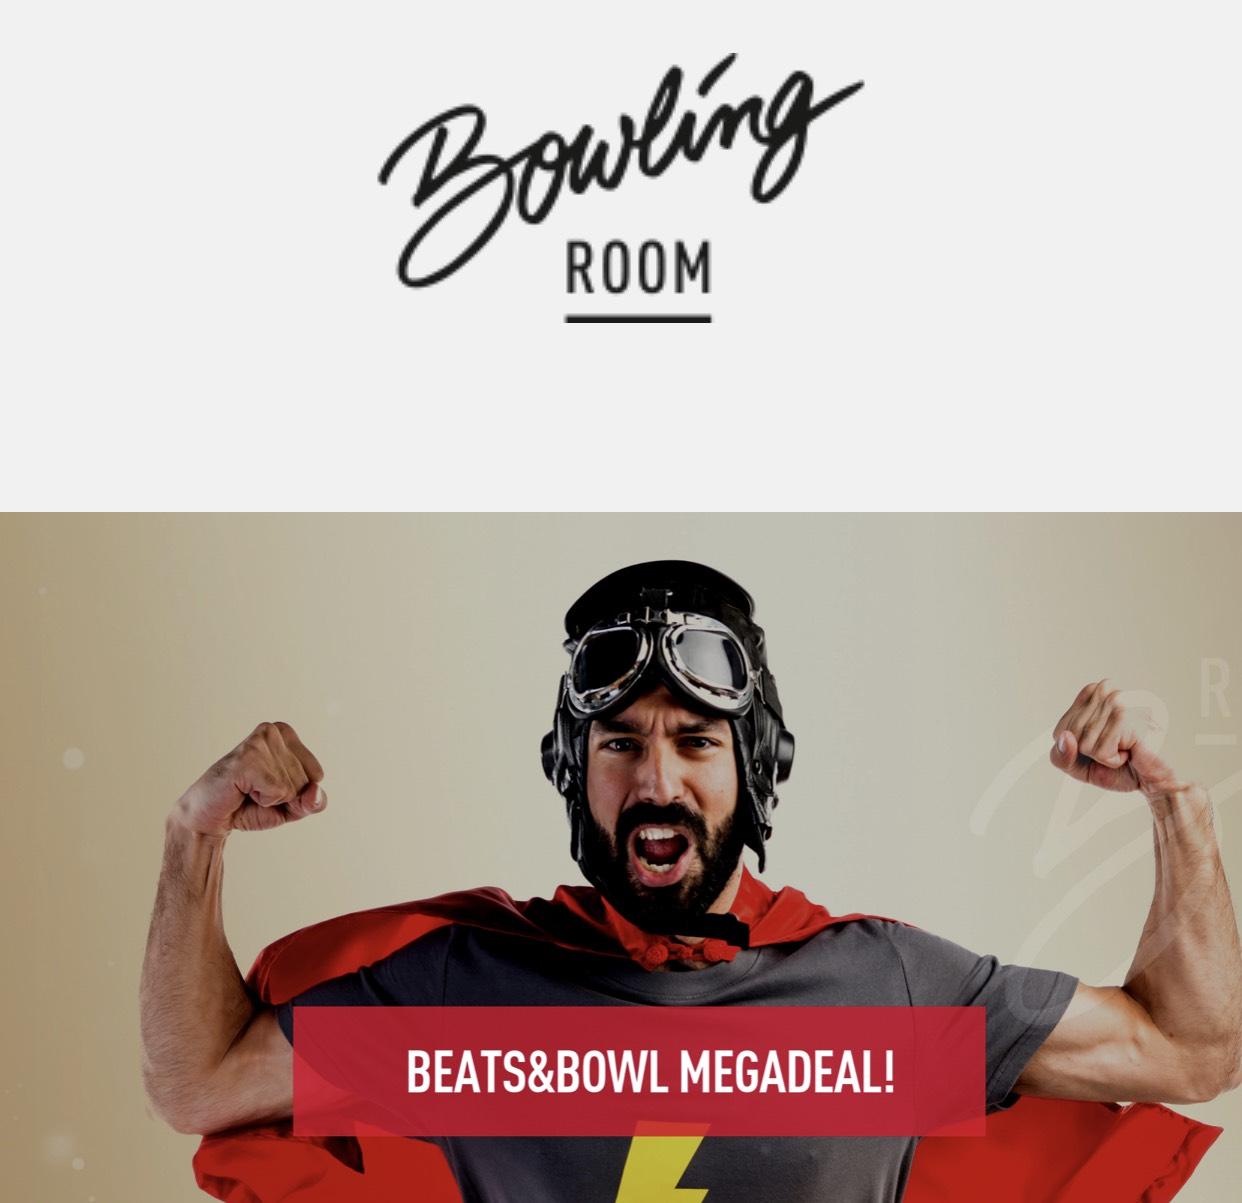 [LOKAL MAINZ] 2h kostenlos Bowlen im BowlingRoom